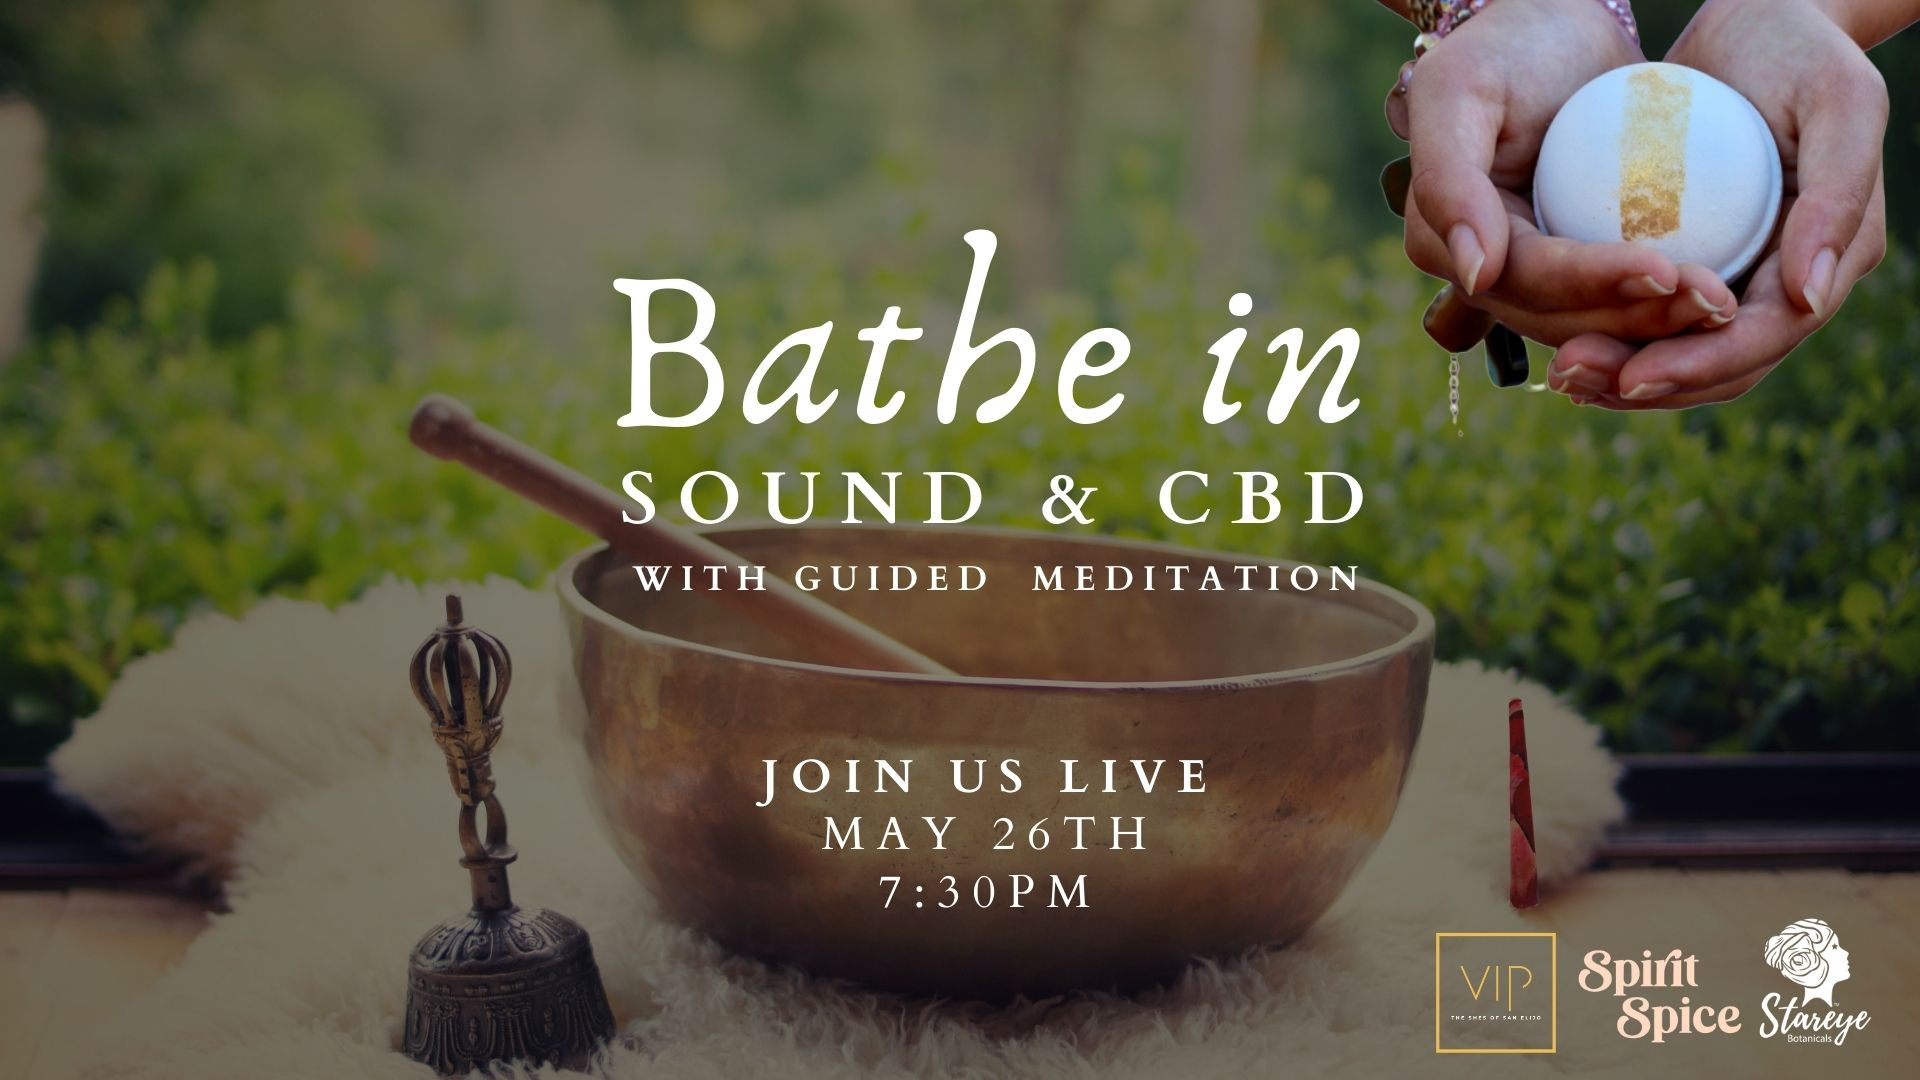 Bathe in Sound & CBD